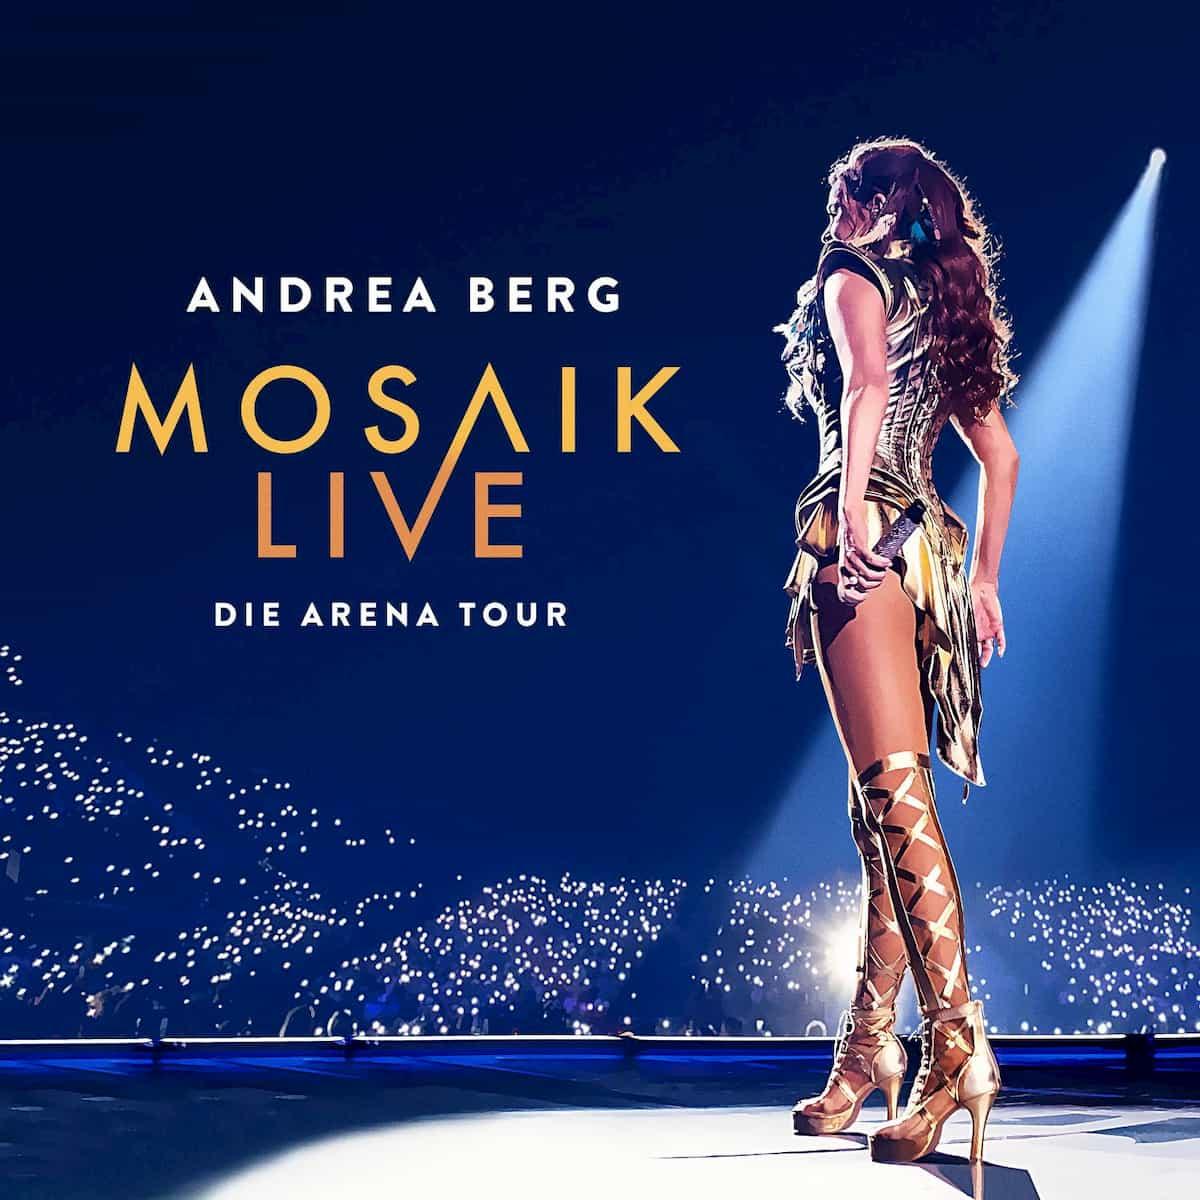 Andrea Berg Live-CD 2020 mit DVD mit Konzert-Ausschnitten